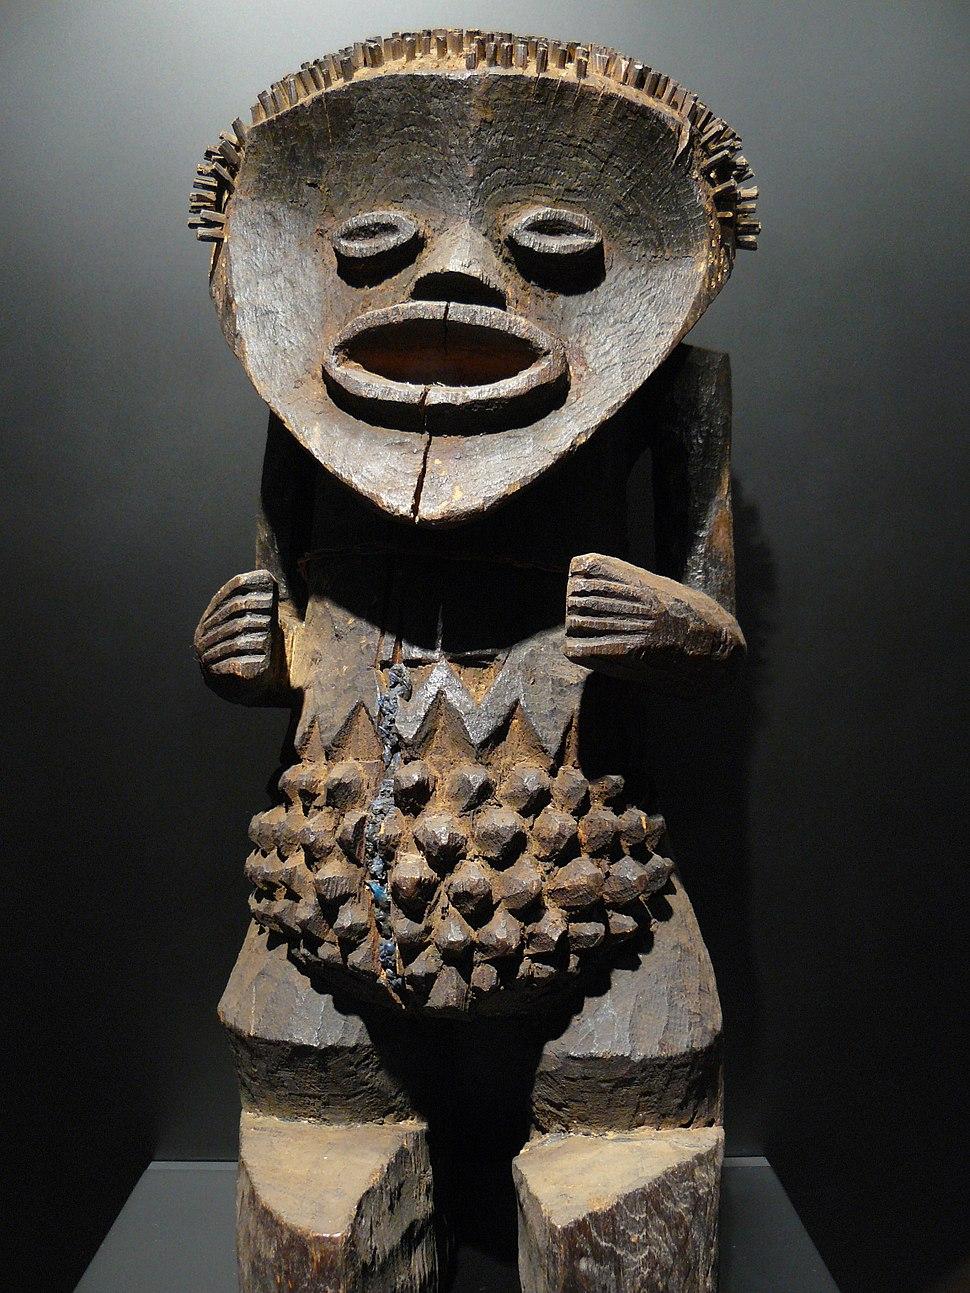 Statuette Mambia Nig%C3%A9ria.jpg